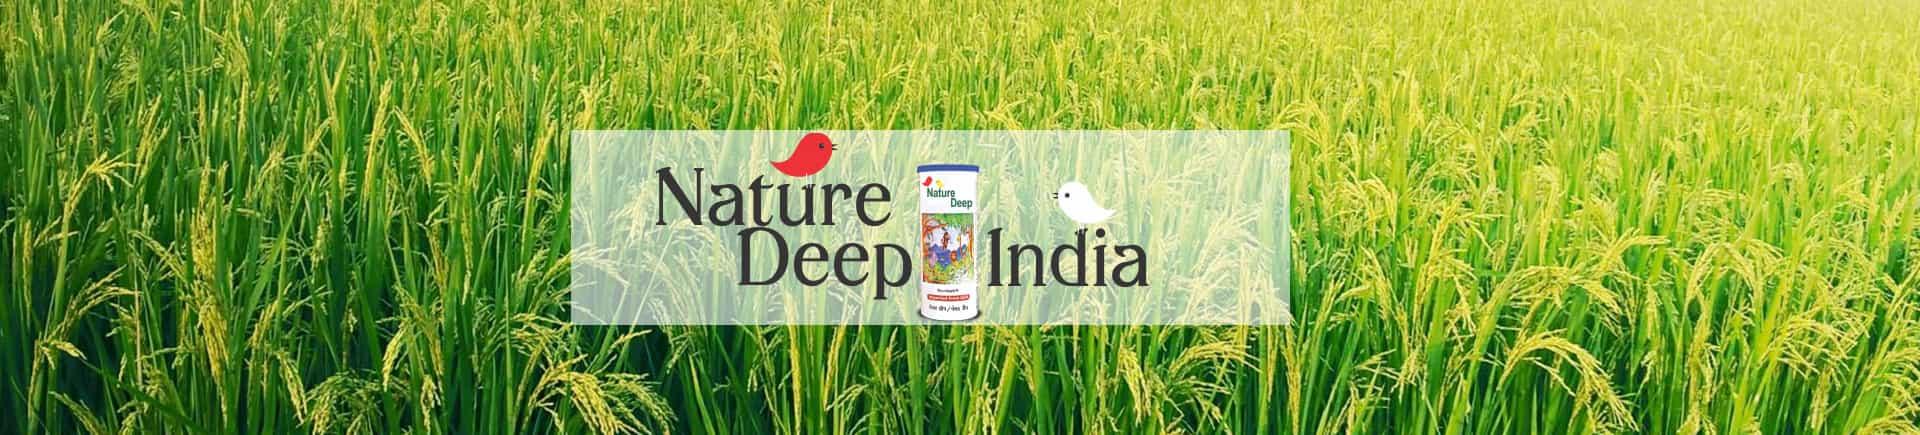 sumitomo naturedeep for paddy crop desktop banner